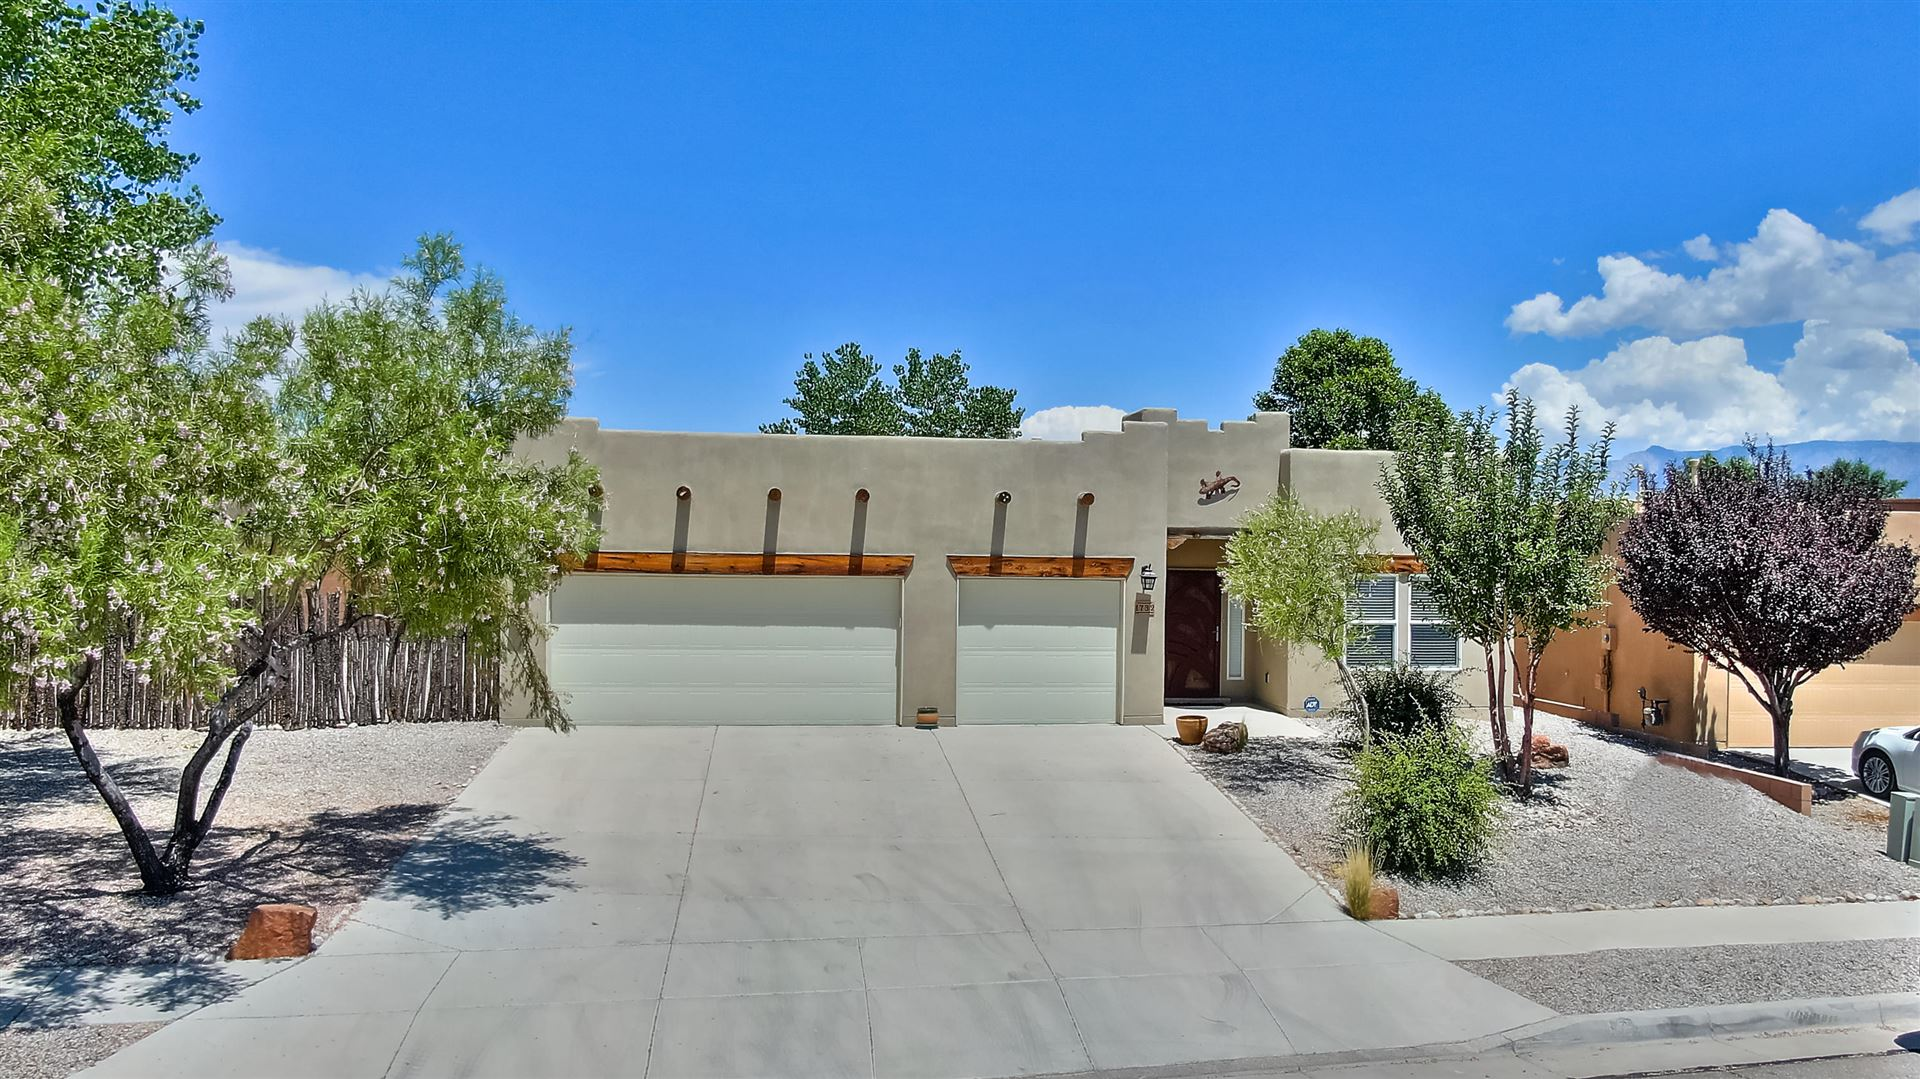 Photo of 1732 Western Hills Drive SE, Rio Rancho, NM 87124 (MLS # 971577)